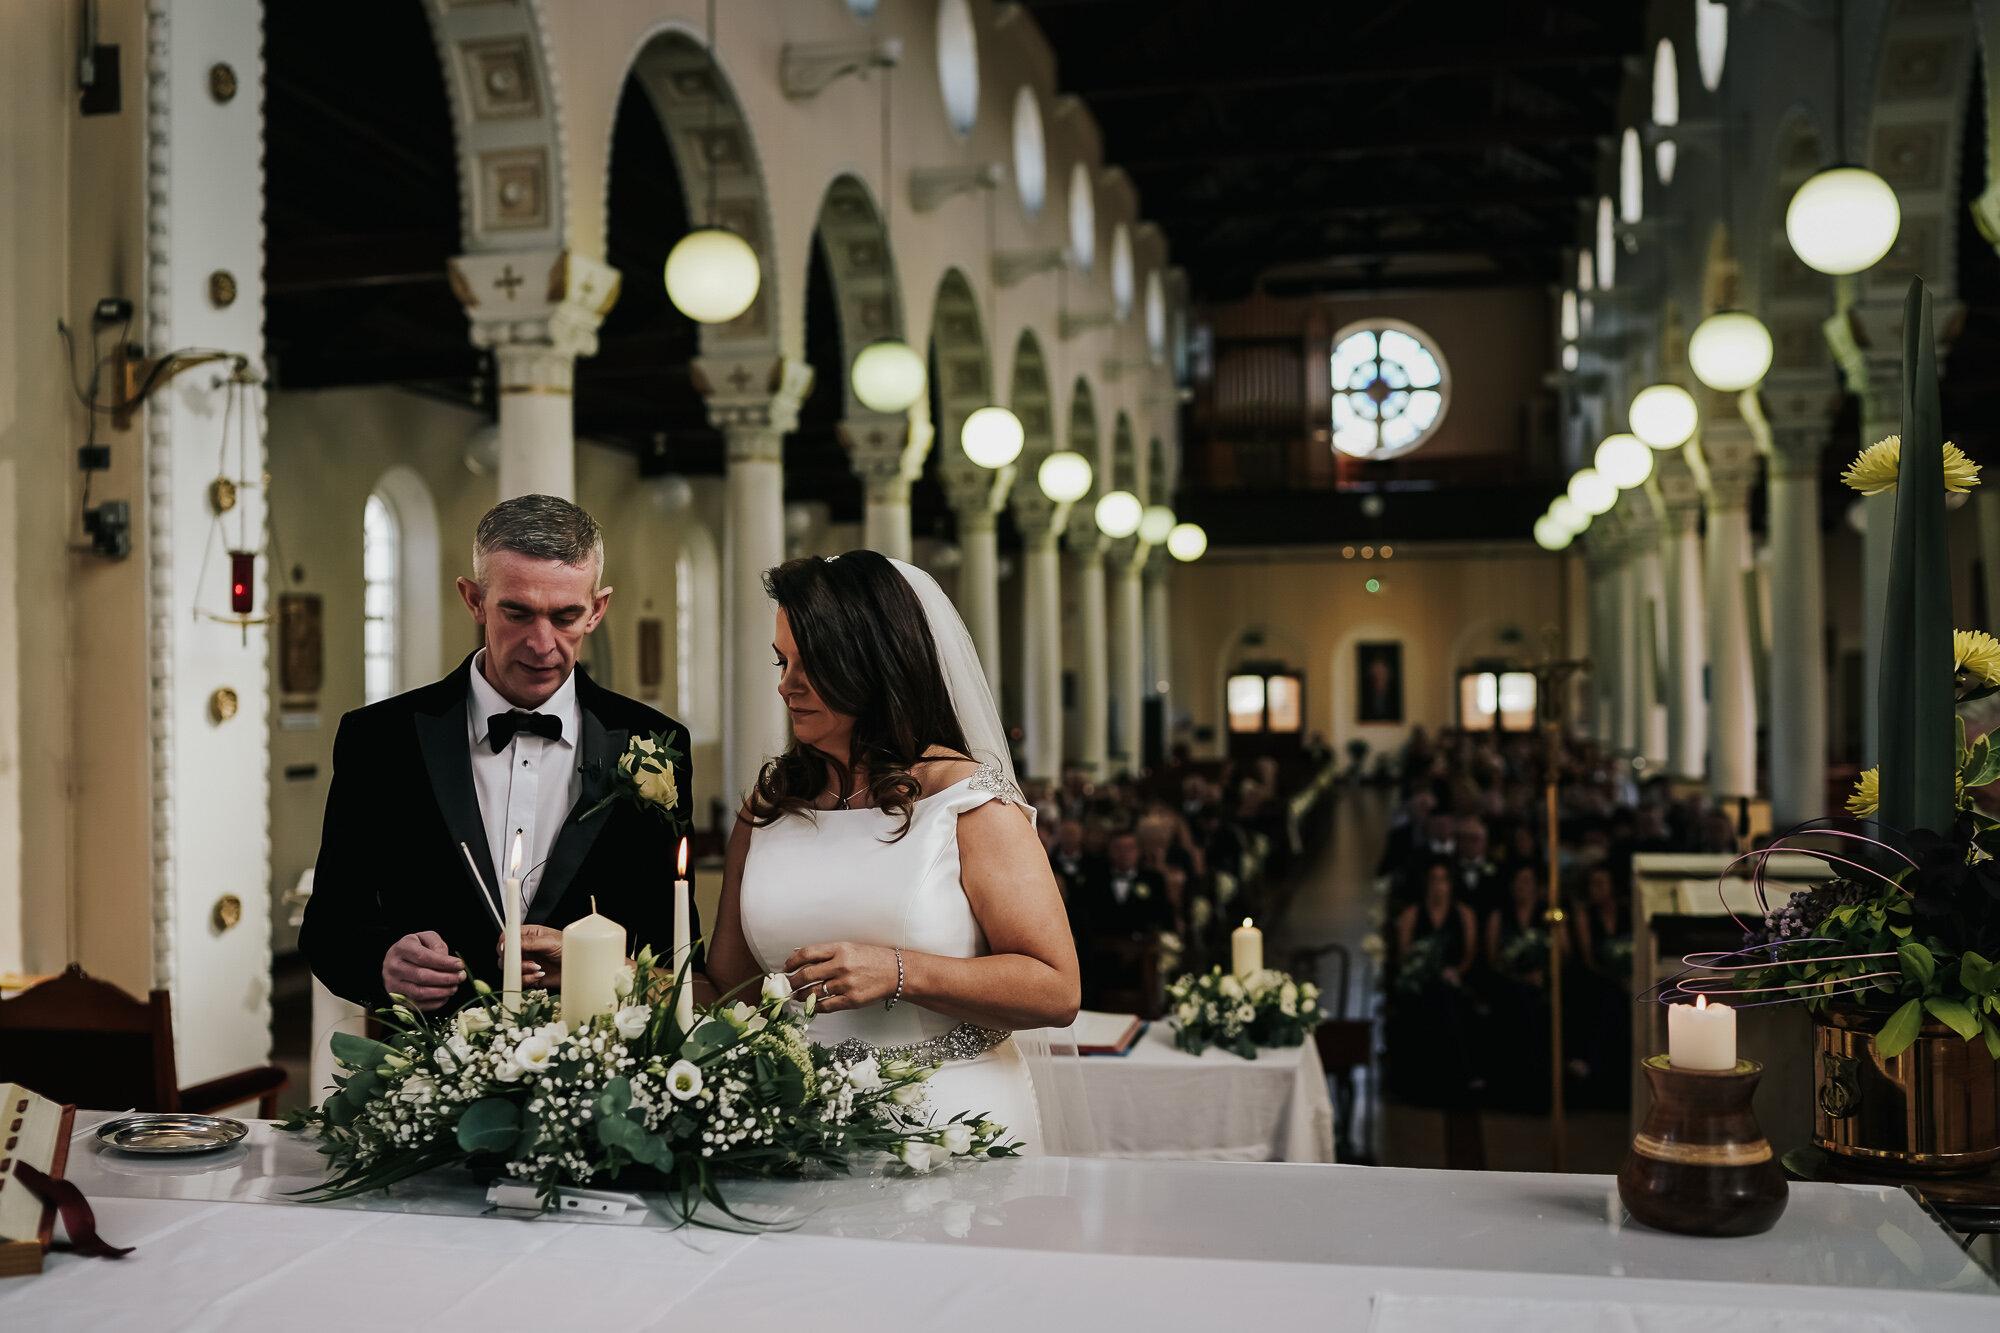 Clontarf Caste wedding photographer Wedding Photography dublin ireland wedding photographer (27 of 58).jpg